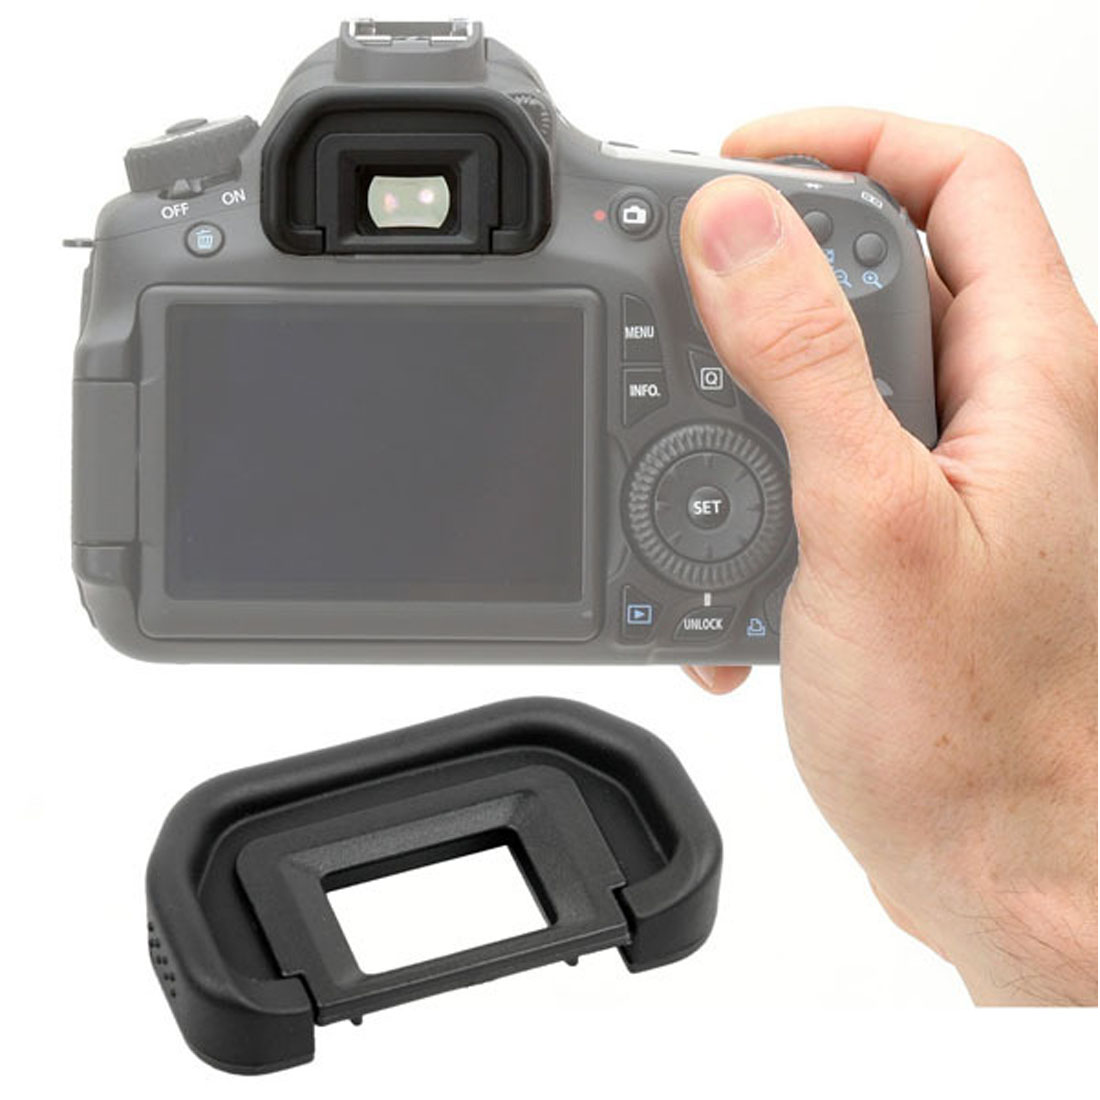 centechia Brand Camera Rubber Eye Cup EyeCup Eyepiece for Canon EOS 60D 50D 5D Mark II 5D2 40D 30D 20D 10D 1100D 1000D наглазник canon eyecup eb eos10d 20d 30d 40d 5d